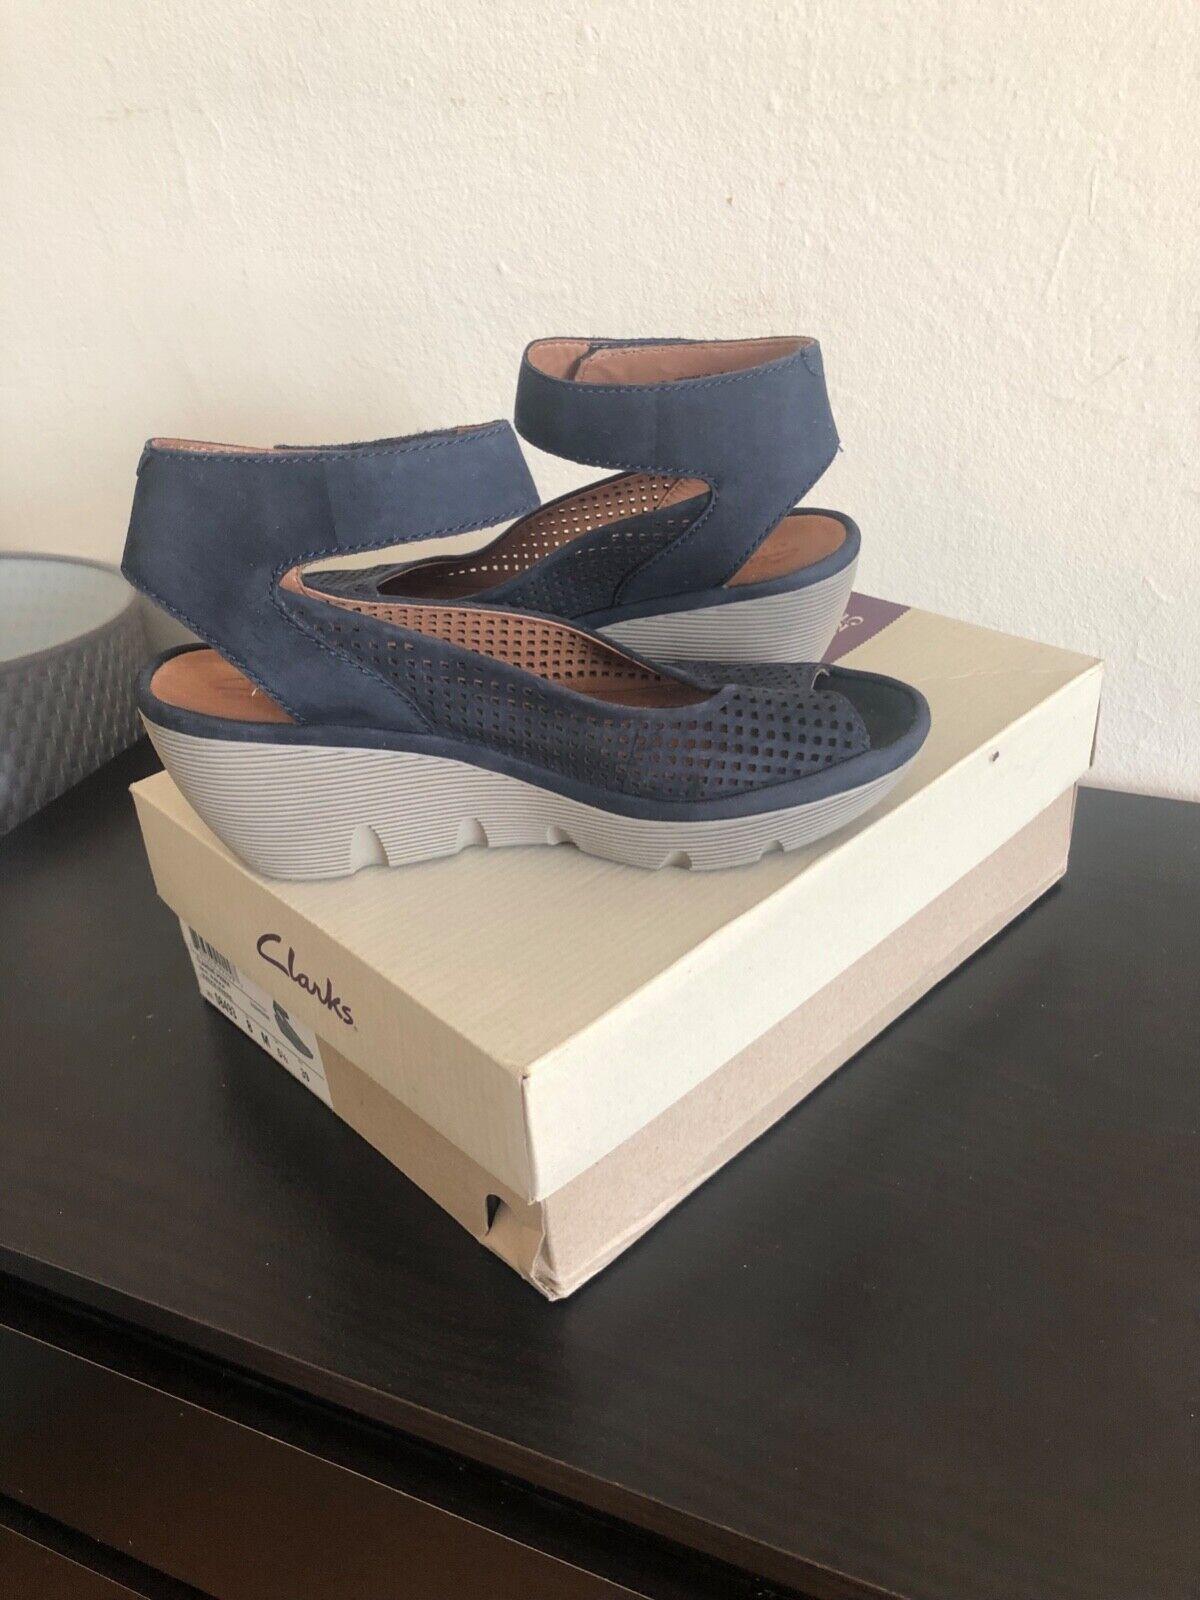 Clarks clarene prima womens sandals navy bluee nubuck size us us us 8 eur 39 4eacc6